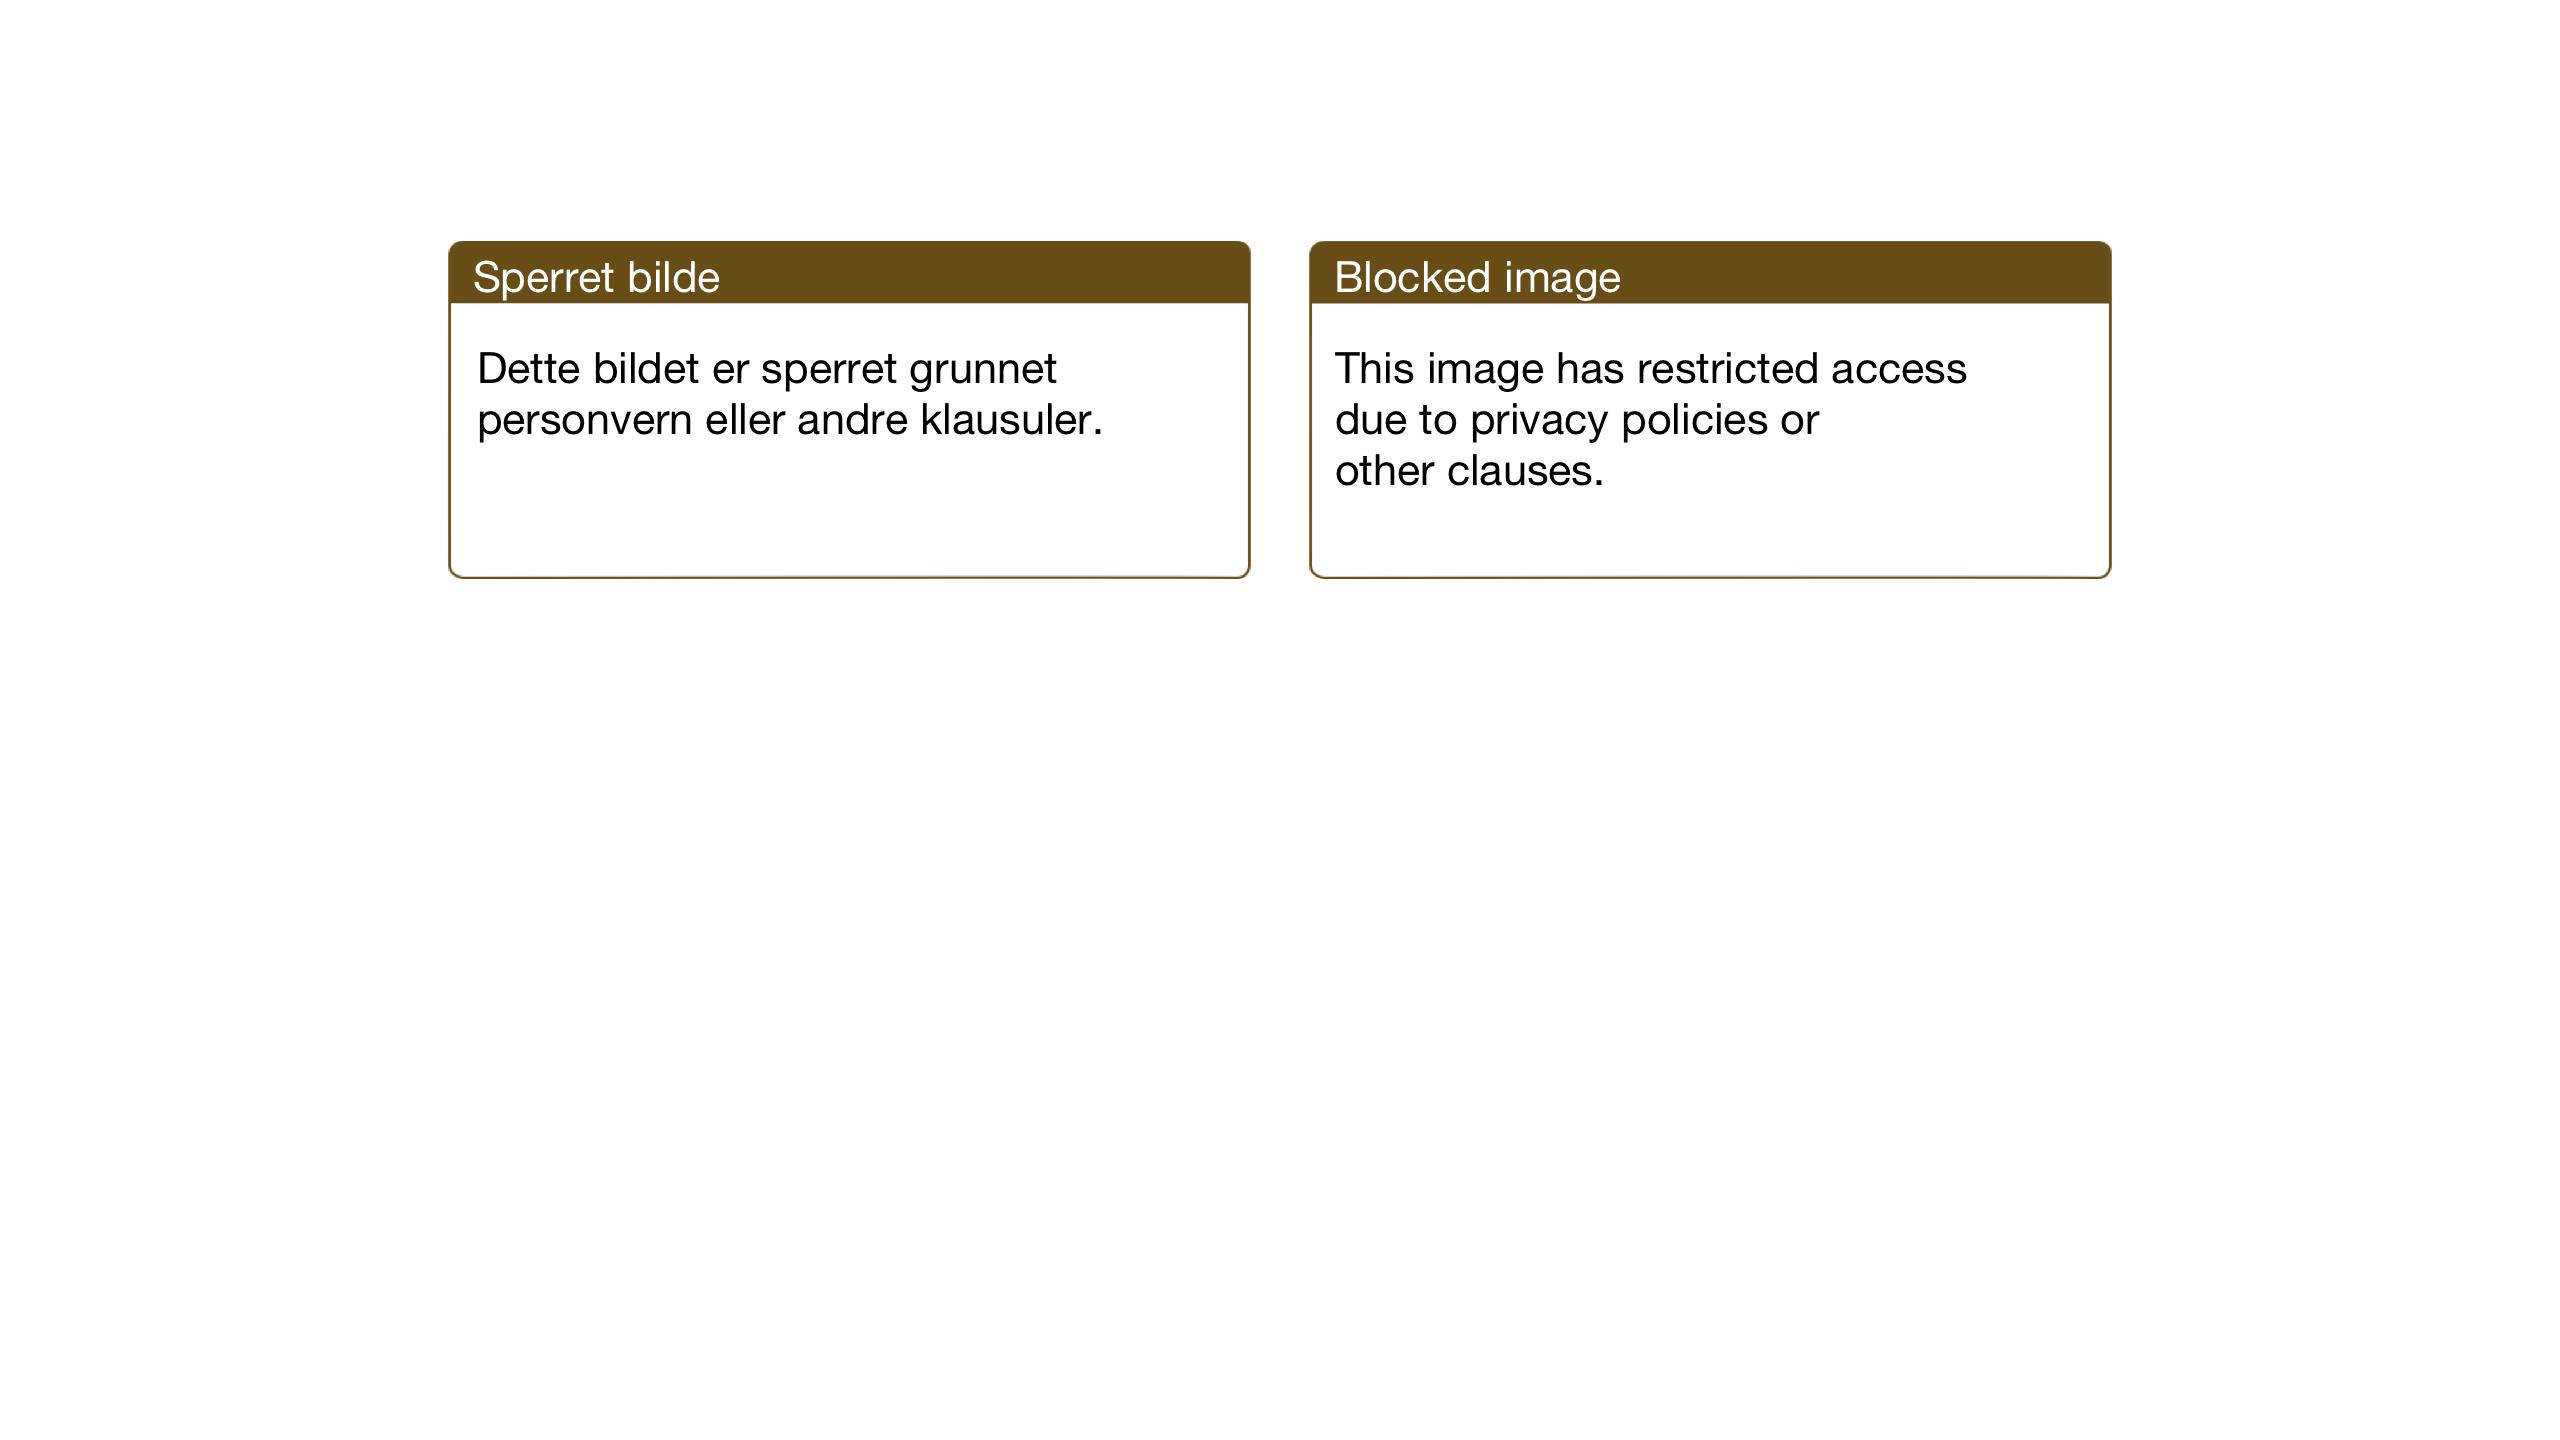 SAH, Vardal prestekontor, H/Ha/Haa/L0018: Ministerialbok nr. 18, 1930-1945, s. 59